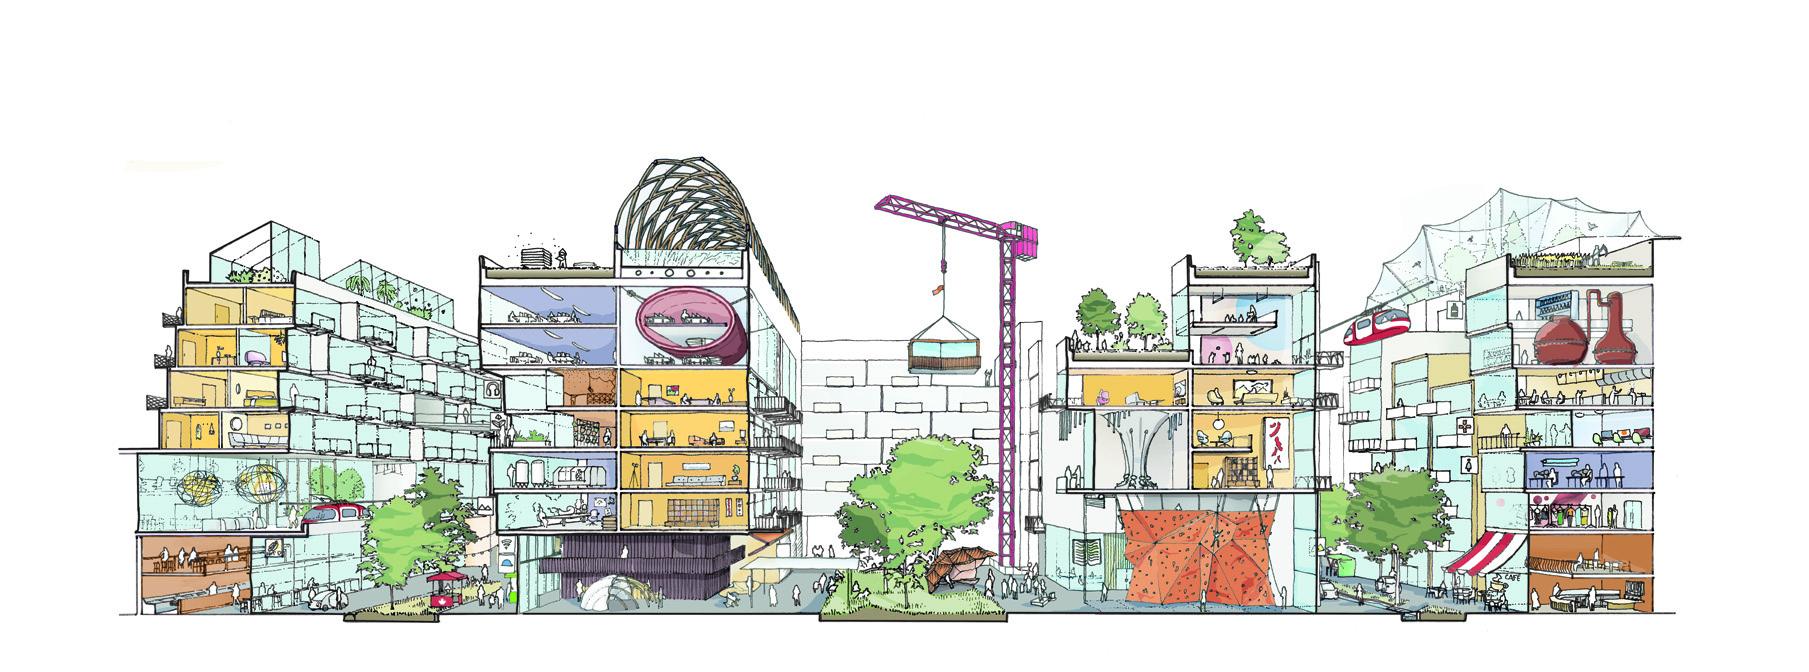 Sidewalk Labs: Google's Guinea-Pig City in Toronto - The